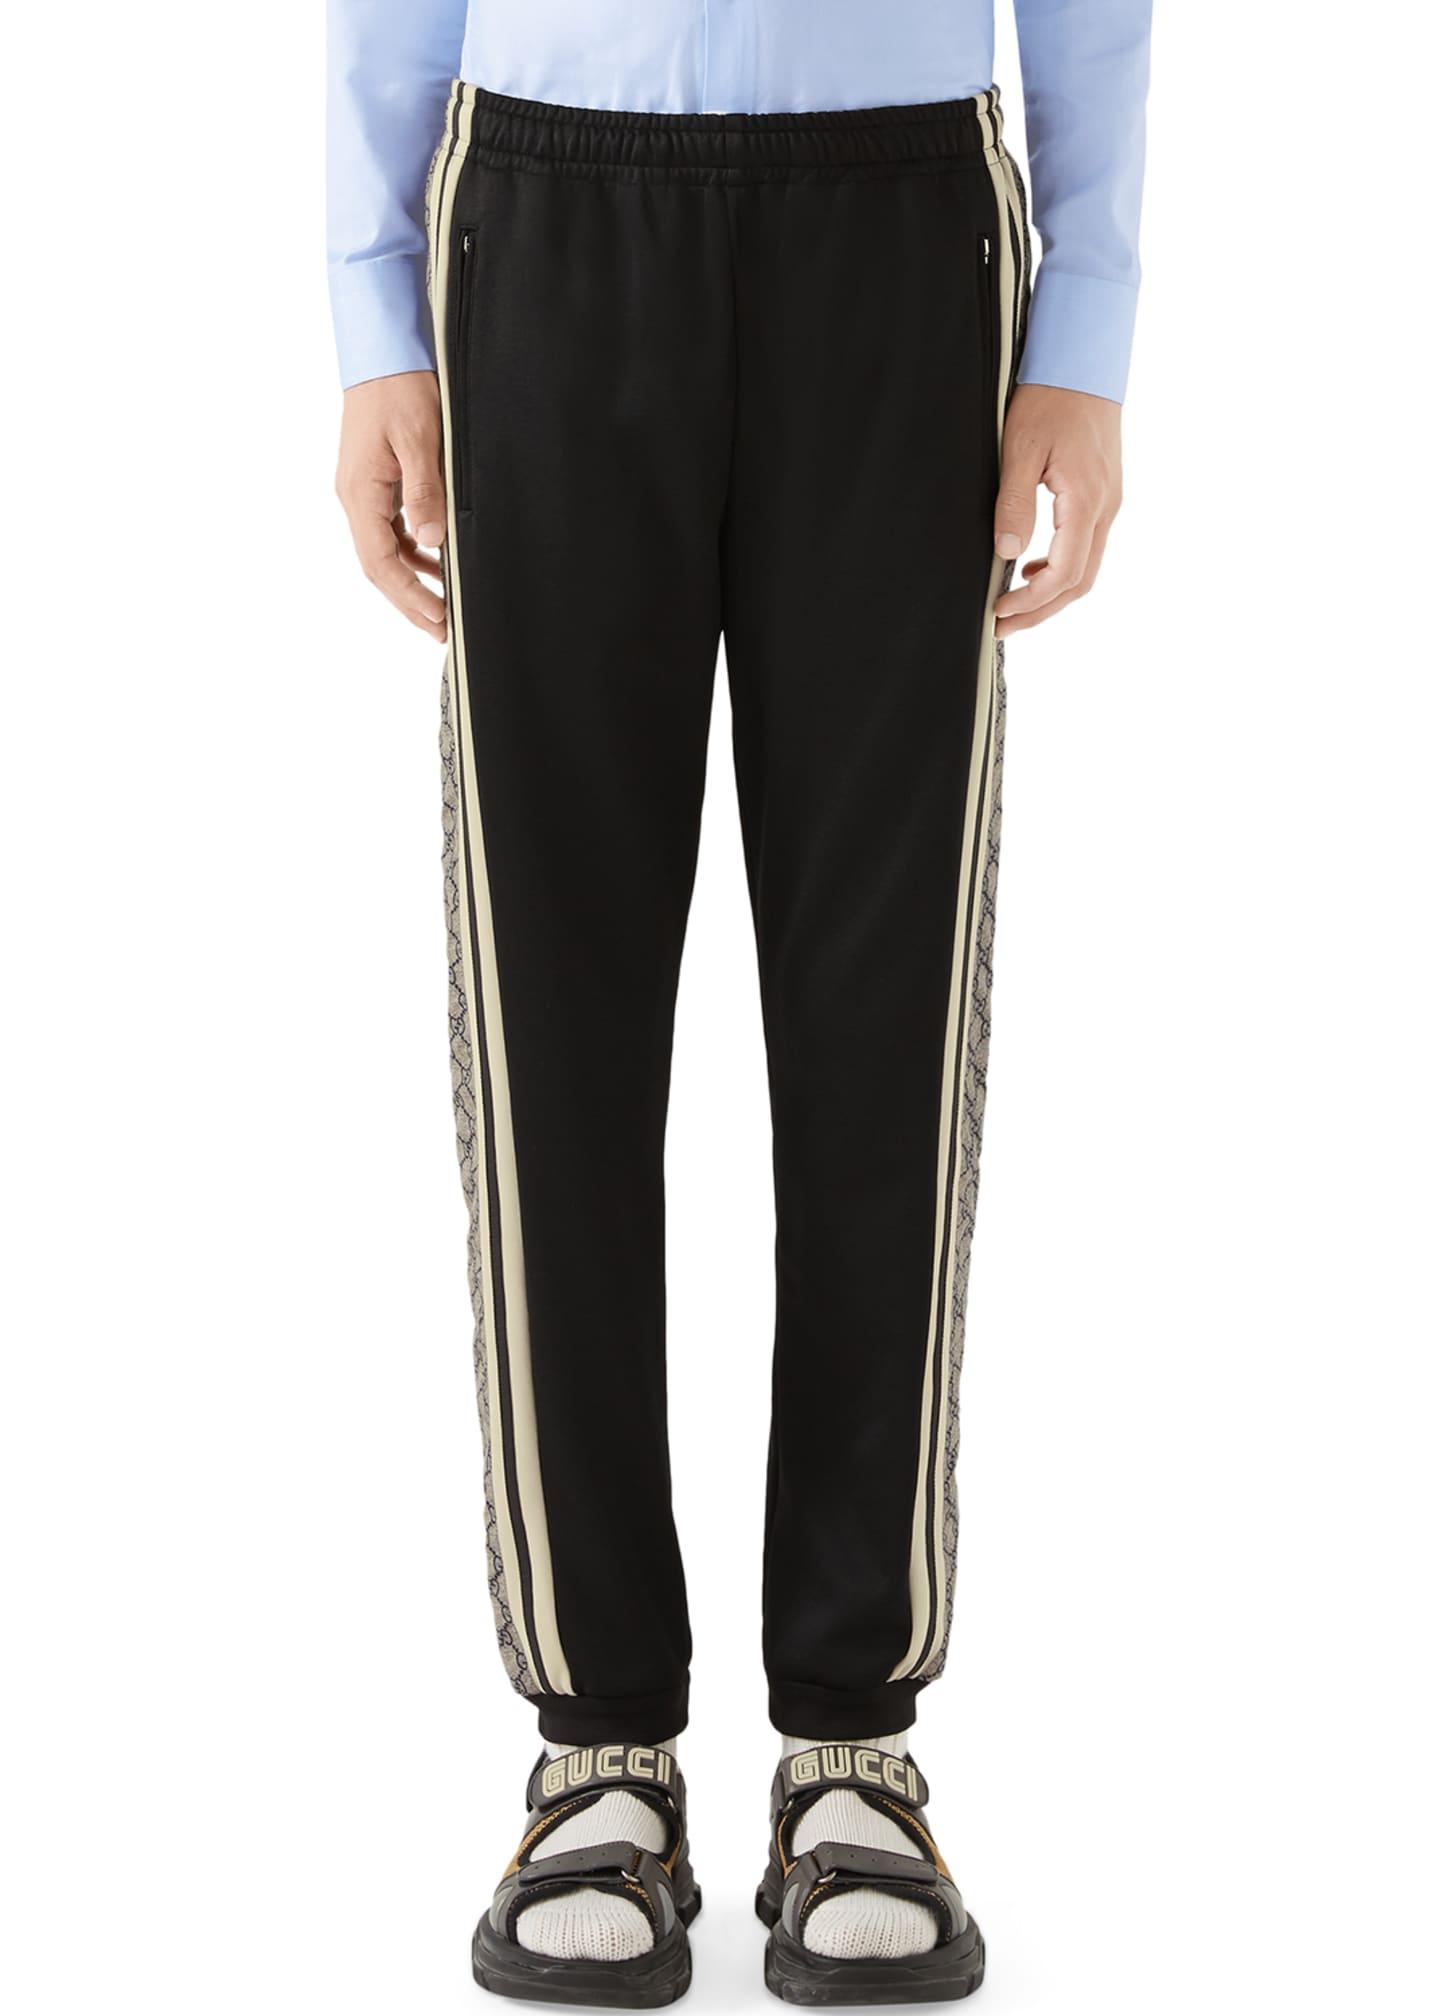 Gucci Men's Cut-And-Sewn GG-Logo Track Pants